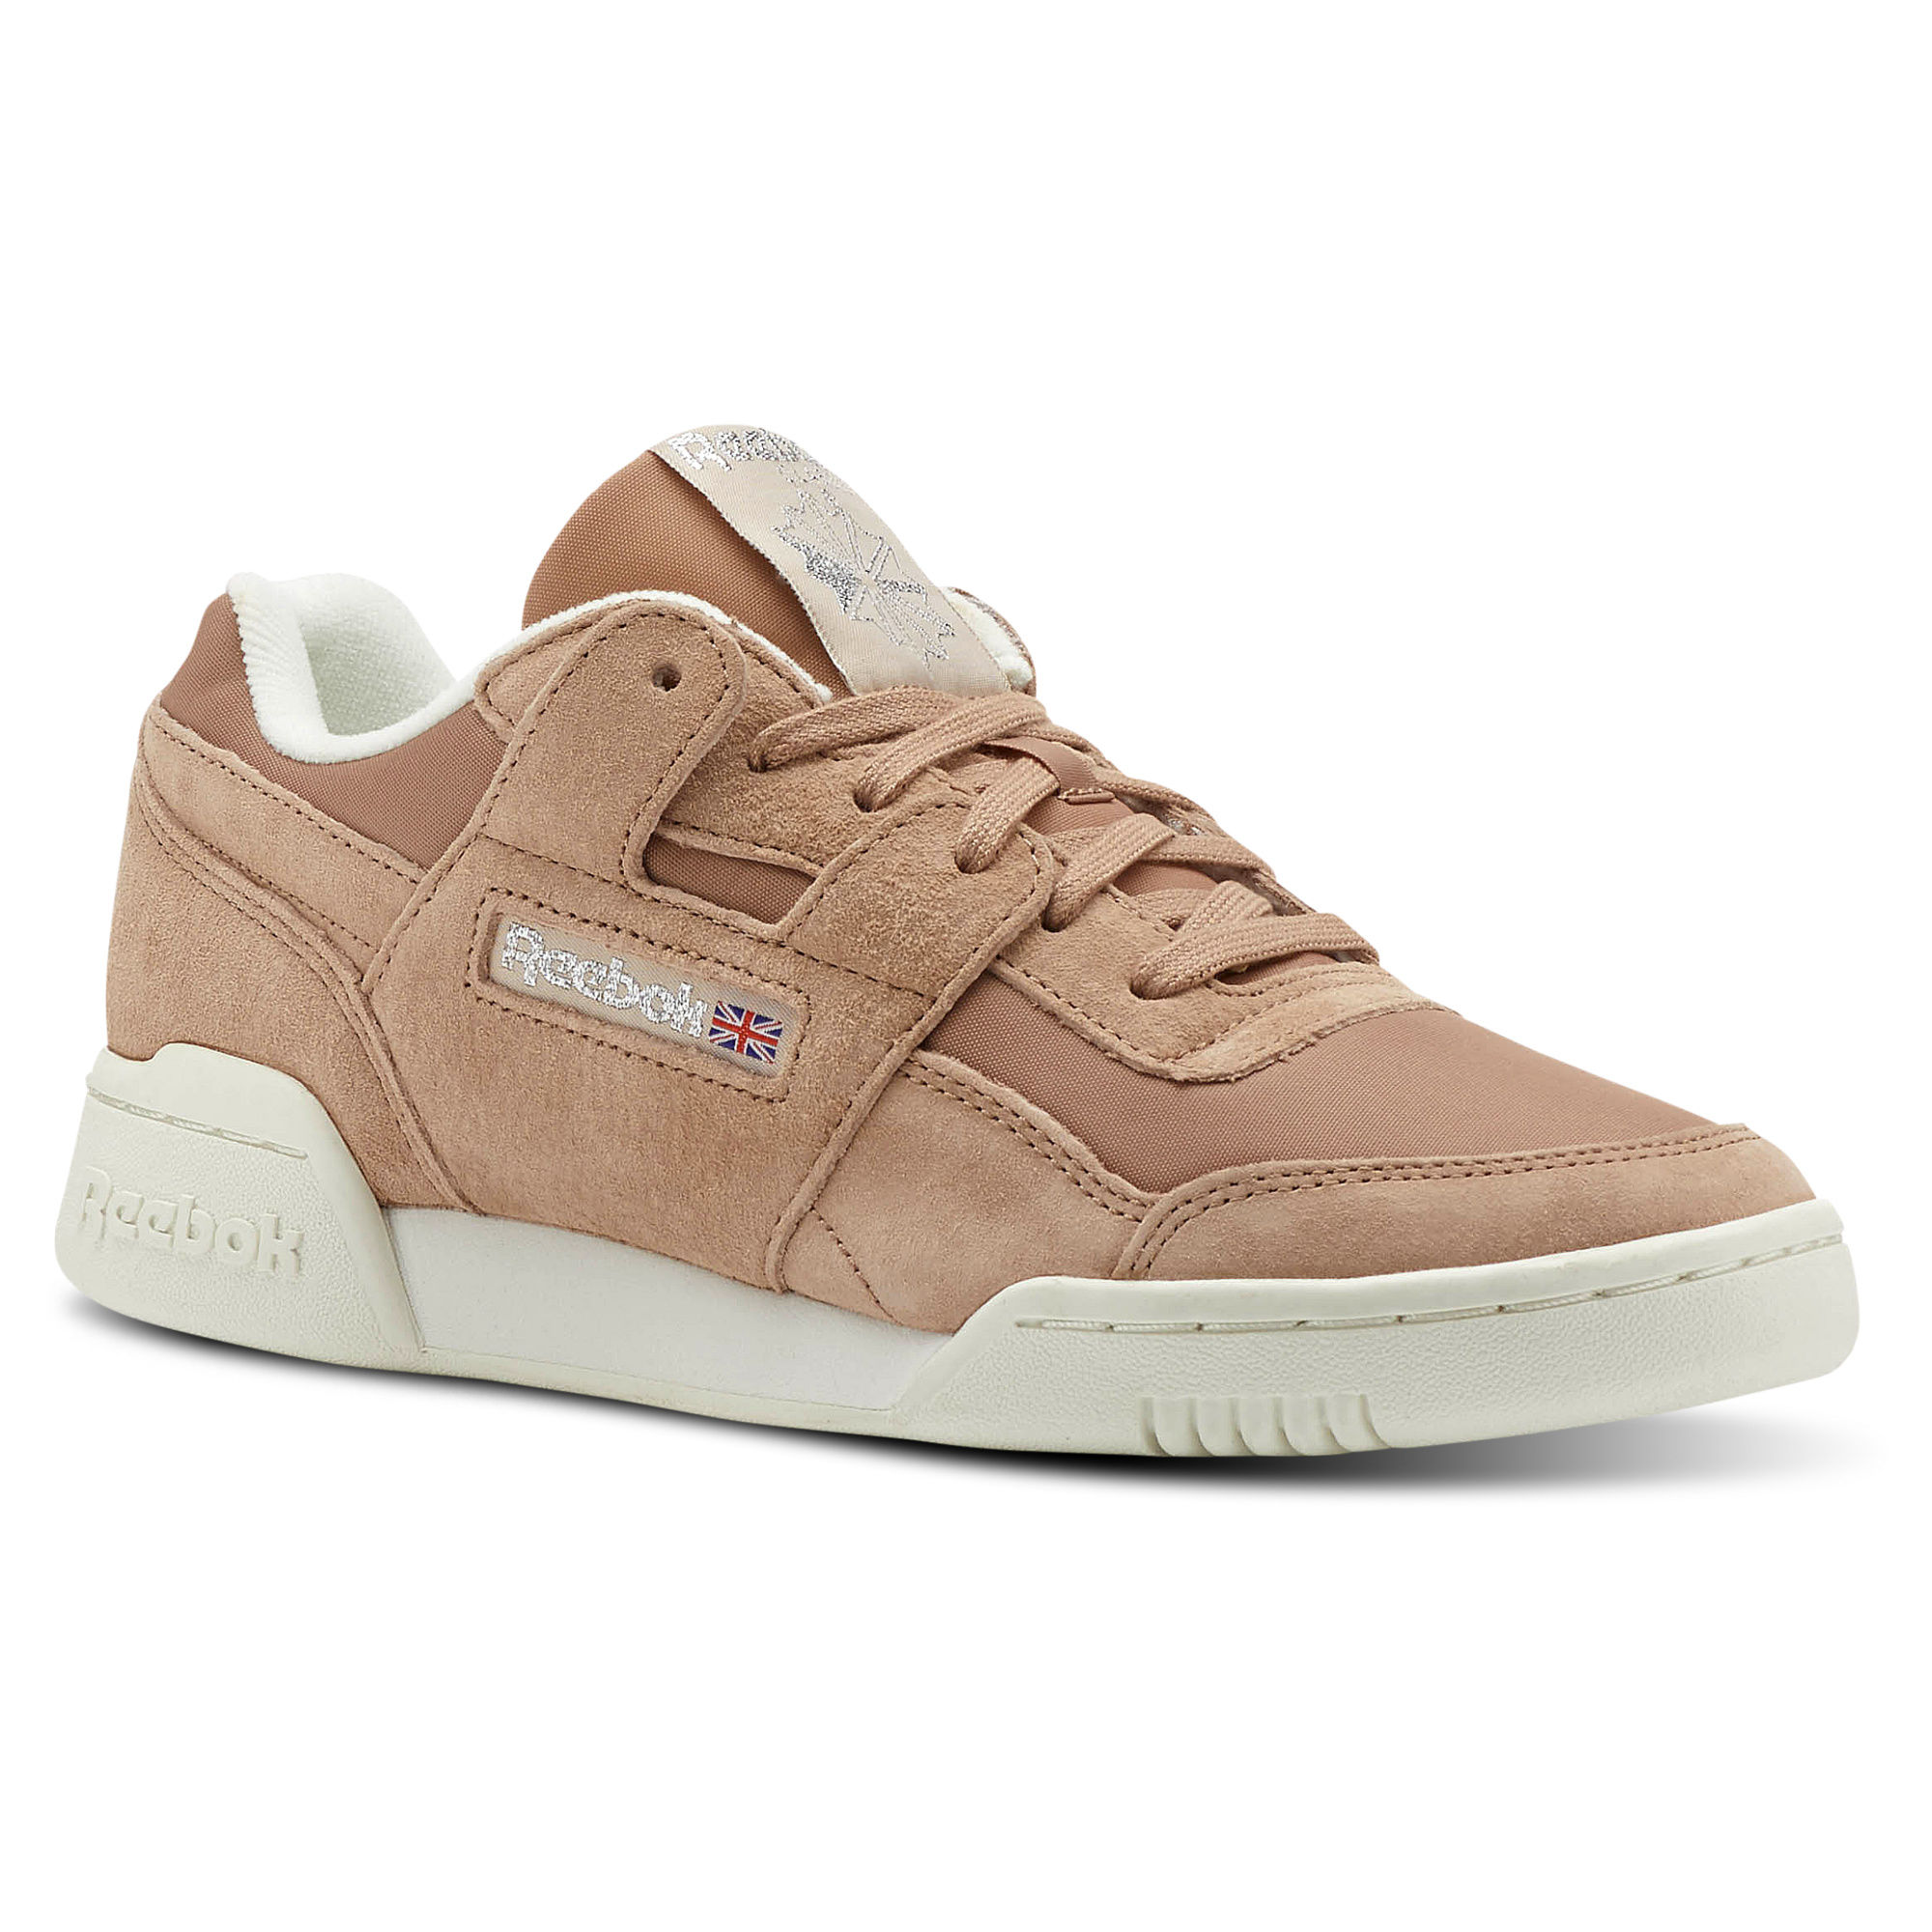 Adidas Snygga Skor Sneakers Rosa Damskor Online